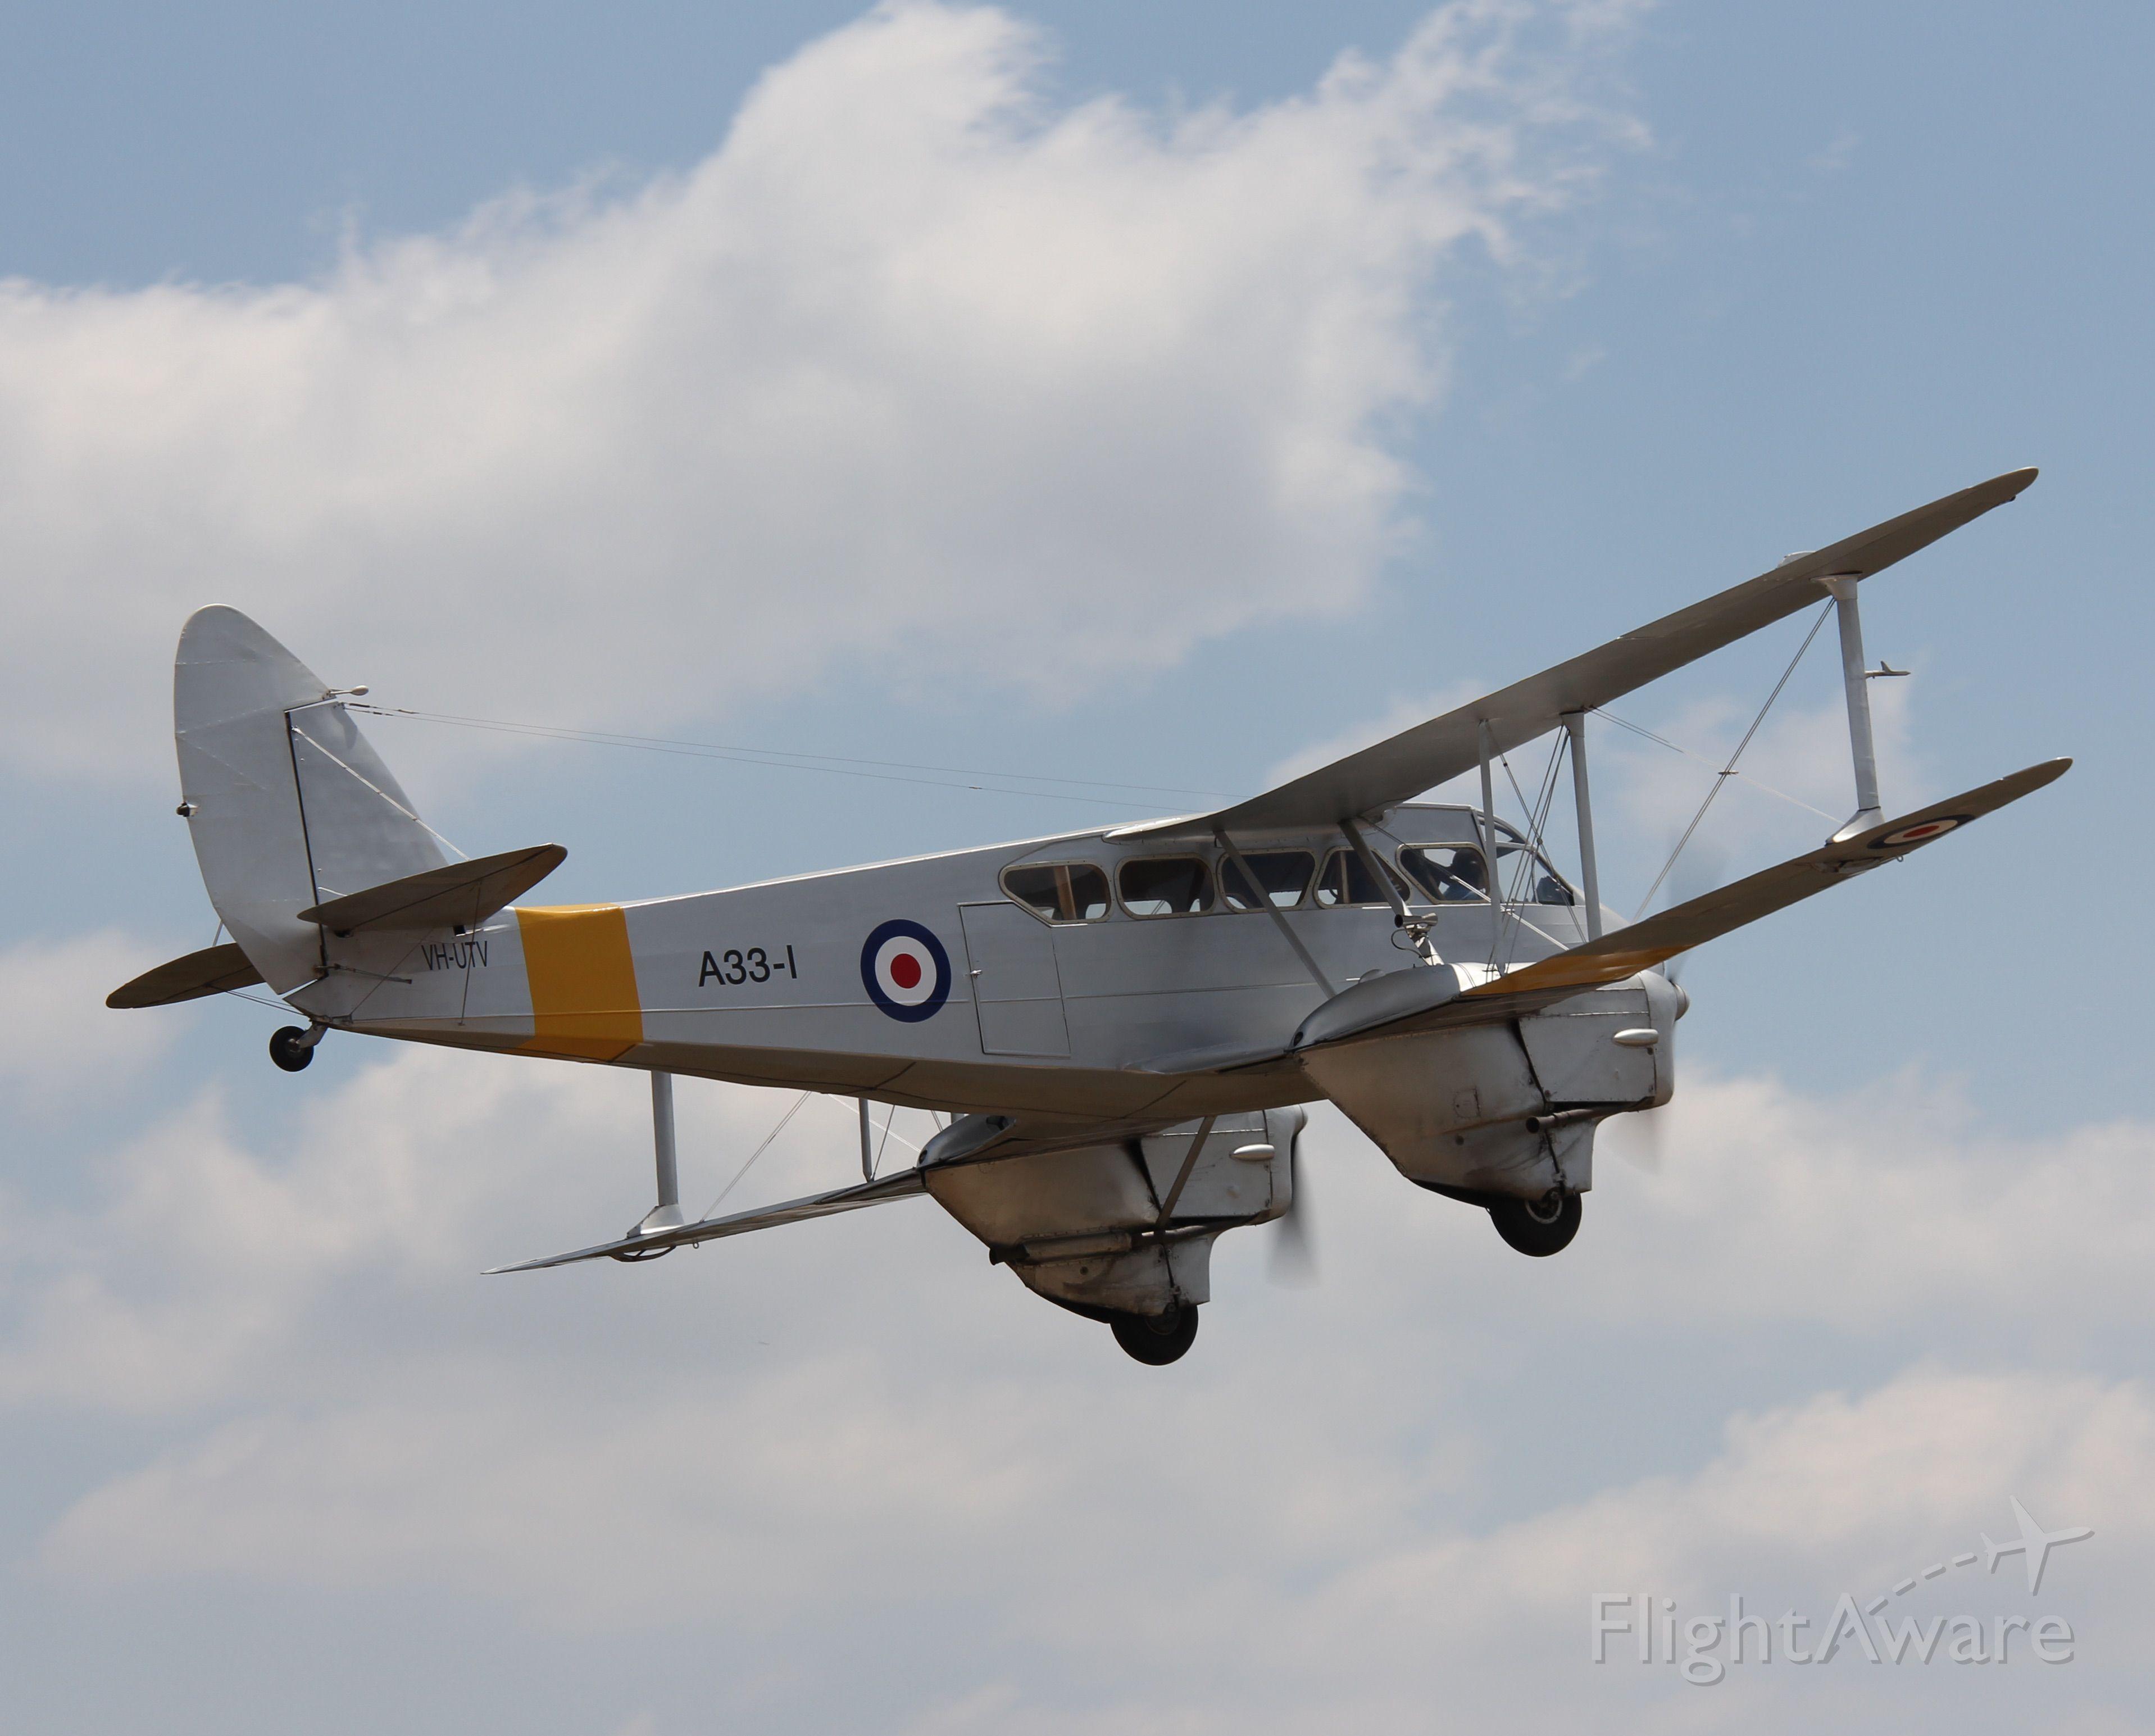 De Havilland Dragon Rapide (VH-UTV) - de Havilland DH-89A Dragon Rapide, in RAAF color.br /Manufactured in 1940, UKbr /Photo: 04.11.2012